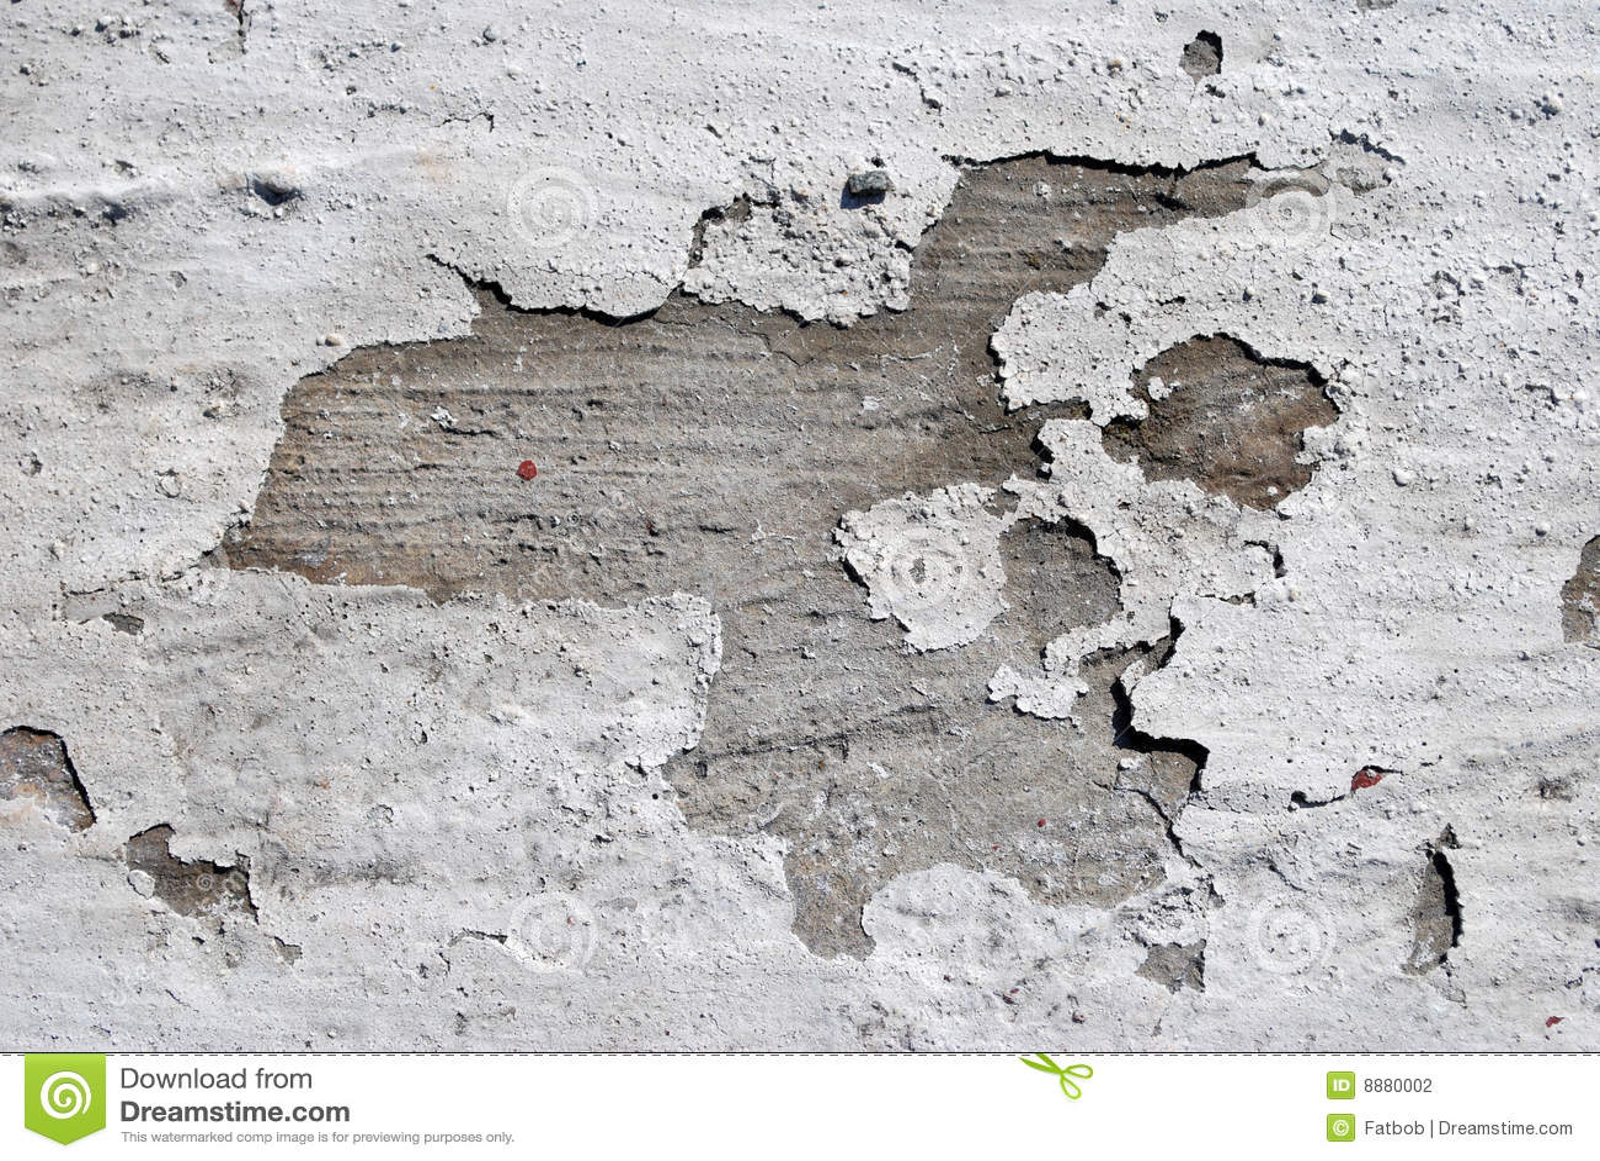 Paint Peeling On Concrete Wall Stock Photo Image 8880002